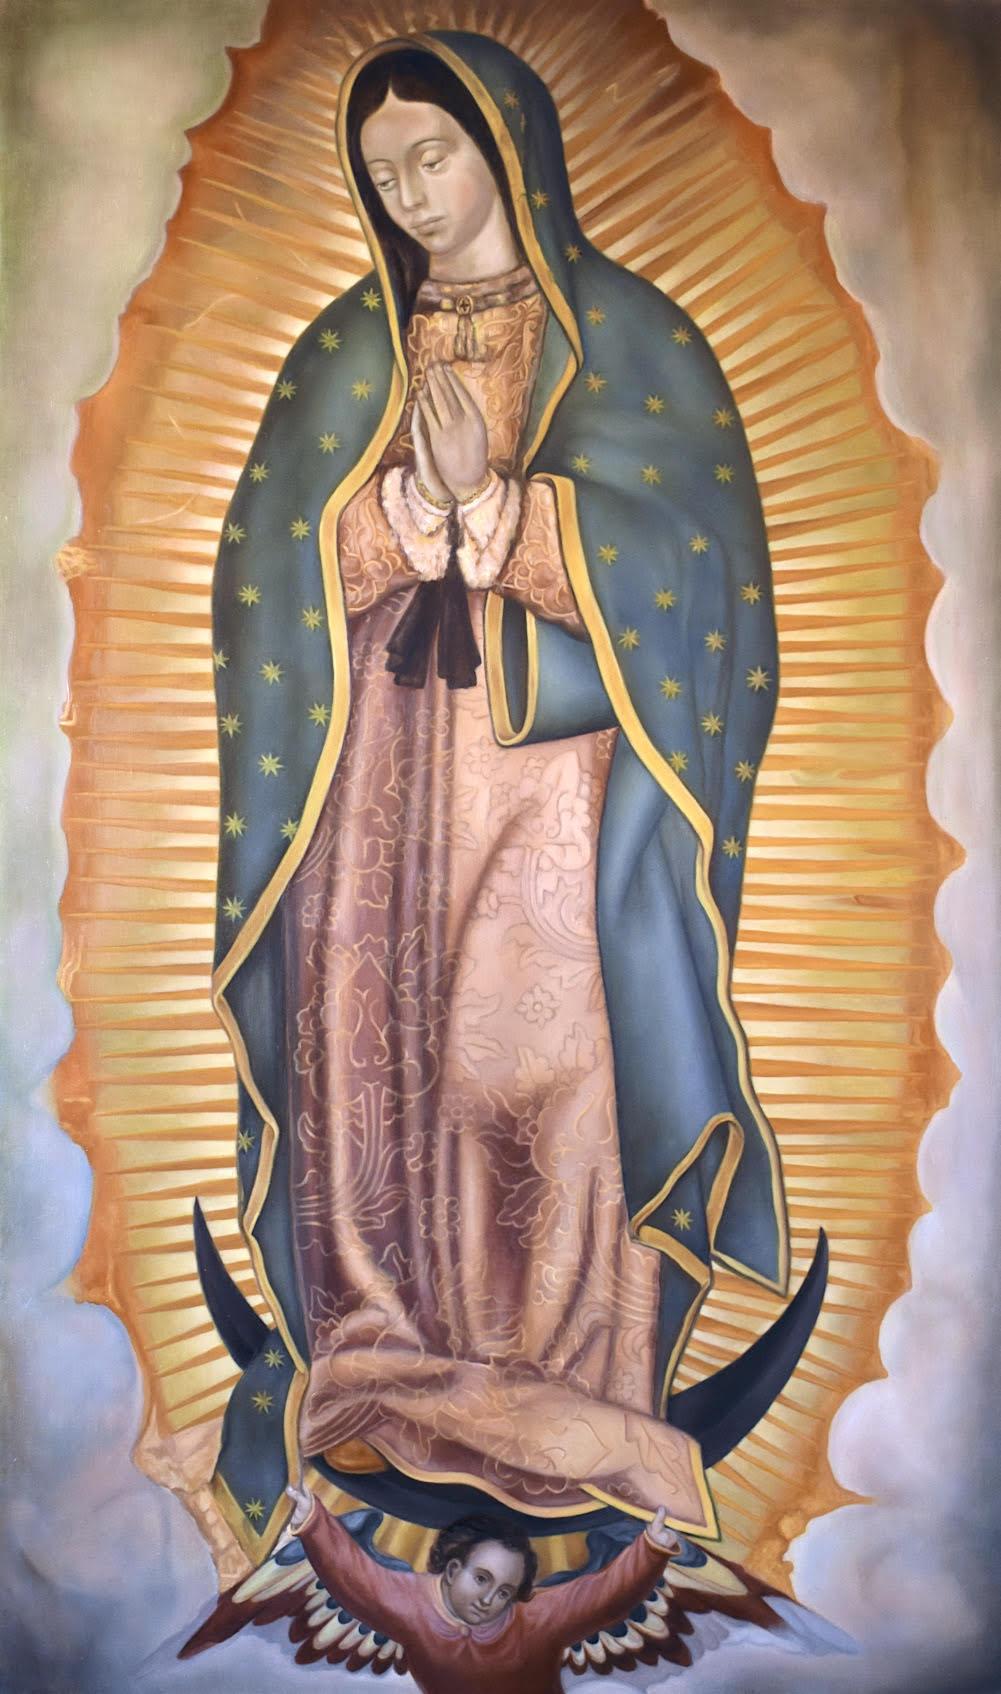 Copy of the image from the Basílica de Santa María de Guadalupe (1531), Nossa Senhora de Guadalupe, oil on canvas, 100 x 60 cm, 2020